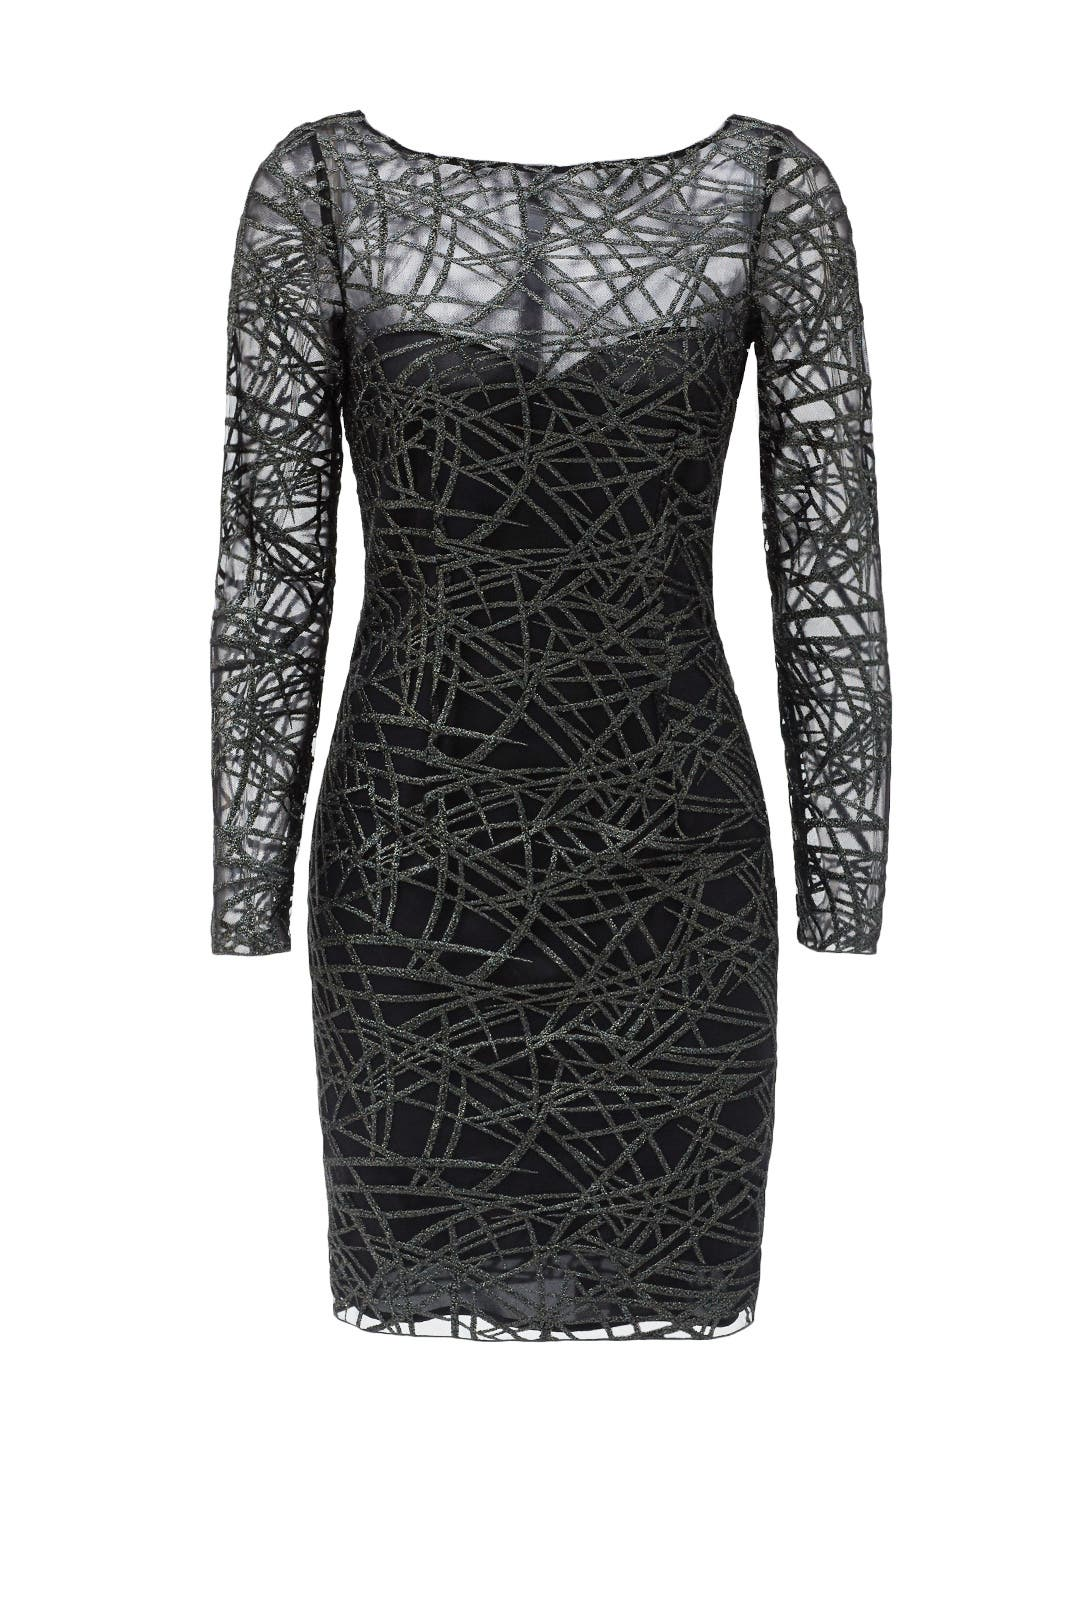 Criss Cross Dress by Blumarine for $300 | Rent the Runway